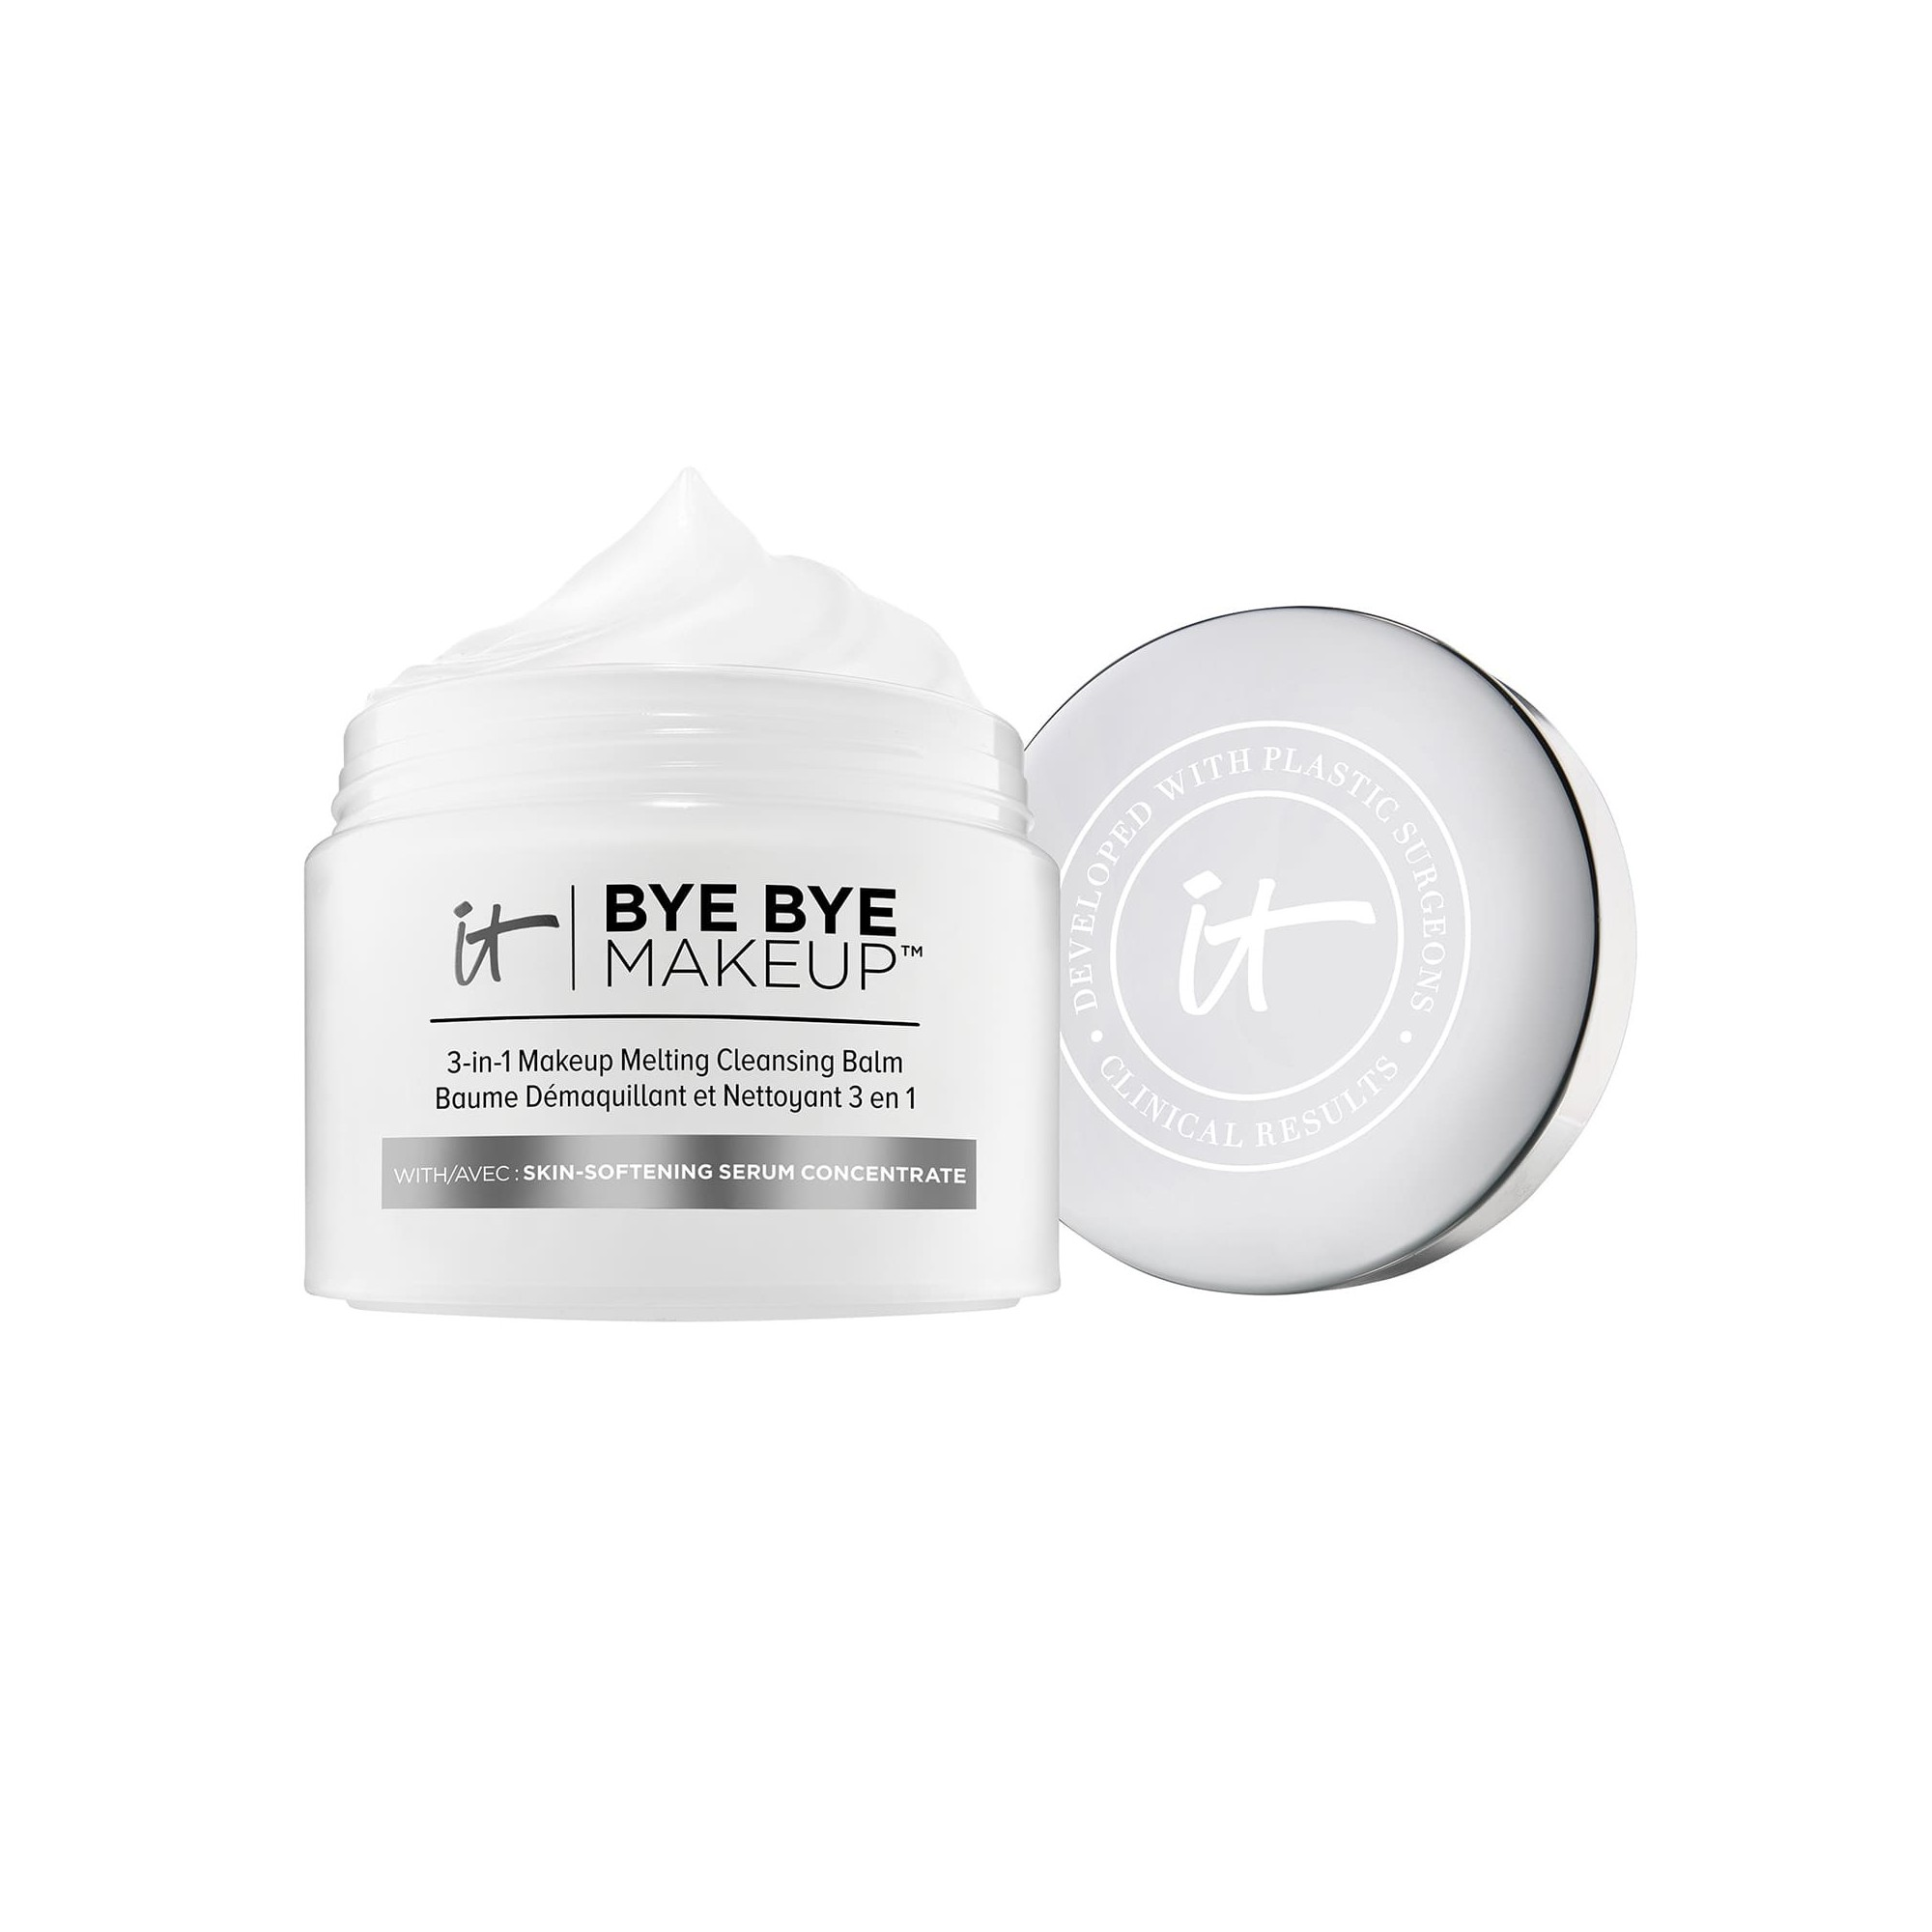 IT Cosmetics Bye Bye Makeup 3-in-1 Makeup Melting Balm